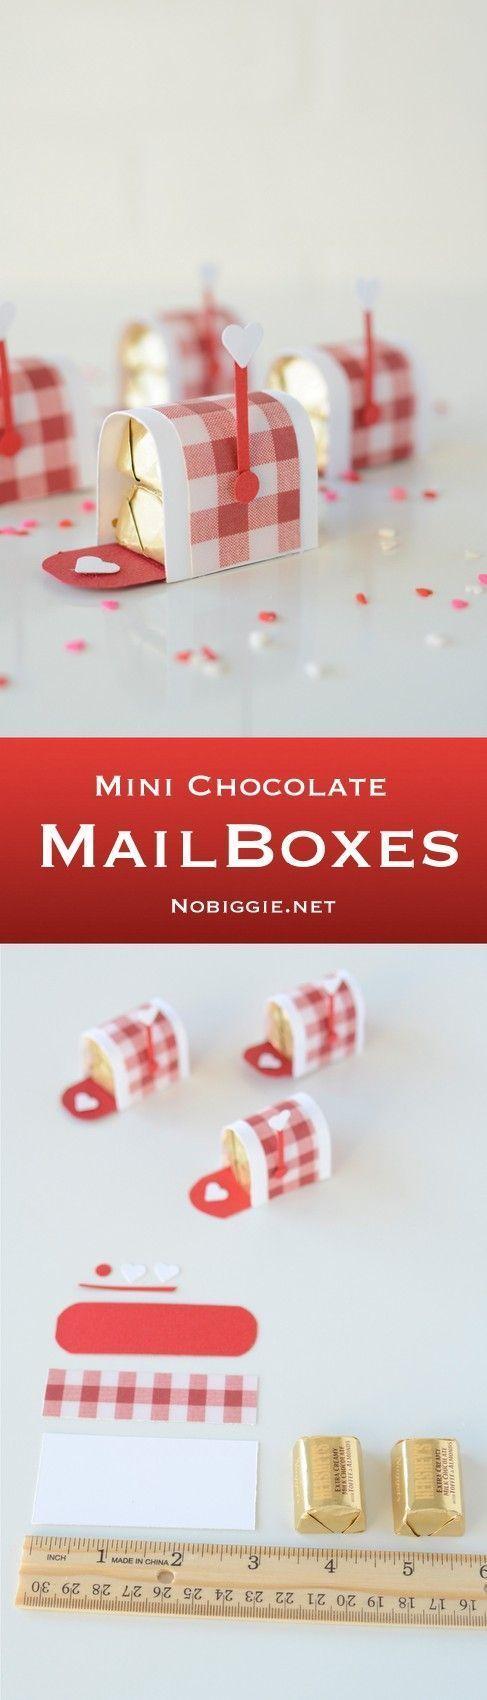 Mini Chocolate Valentine's Day chocolates